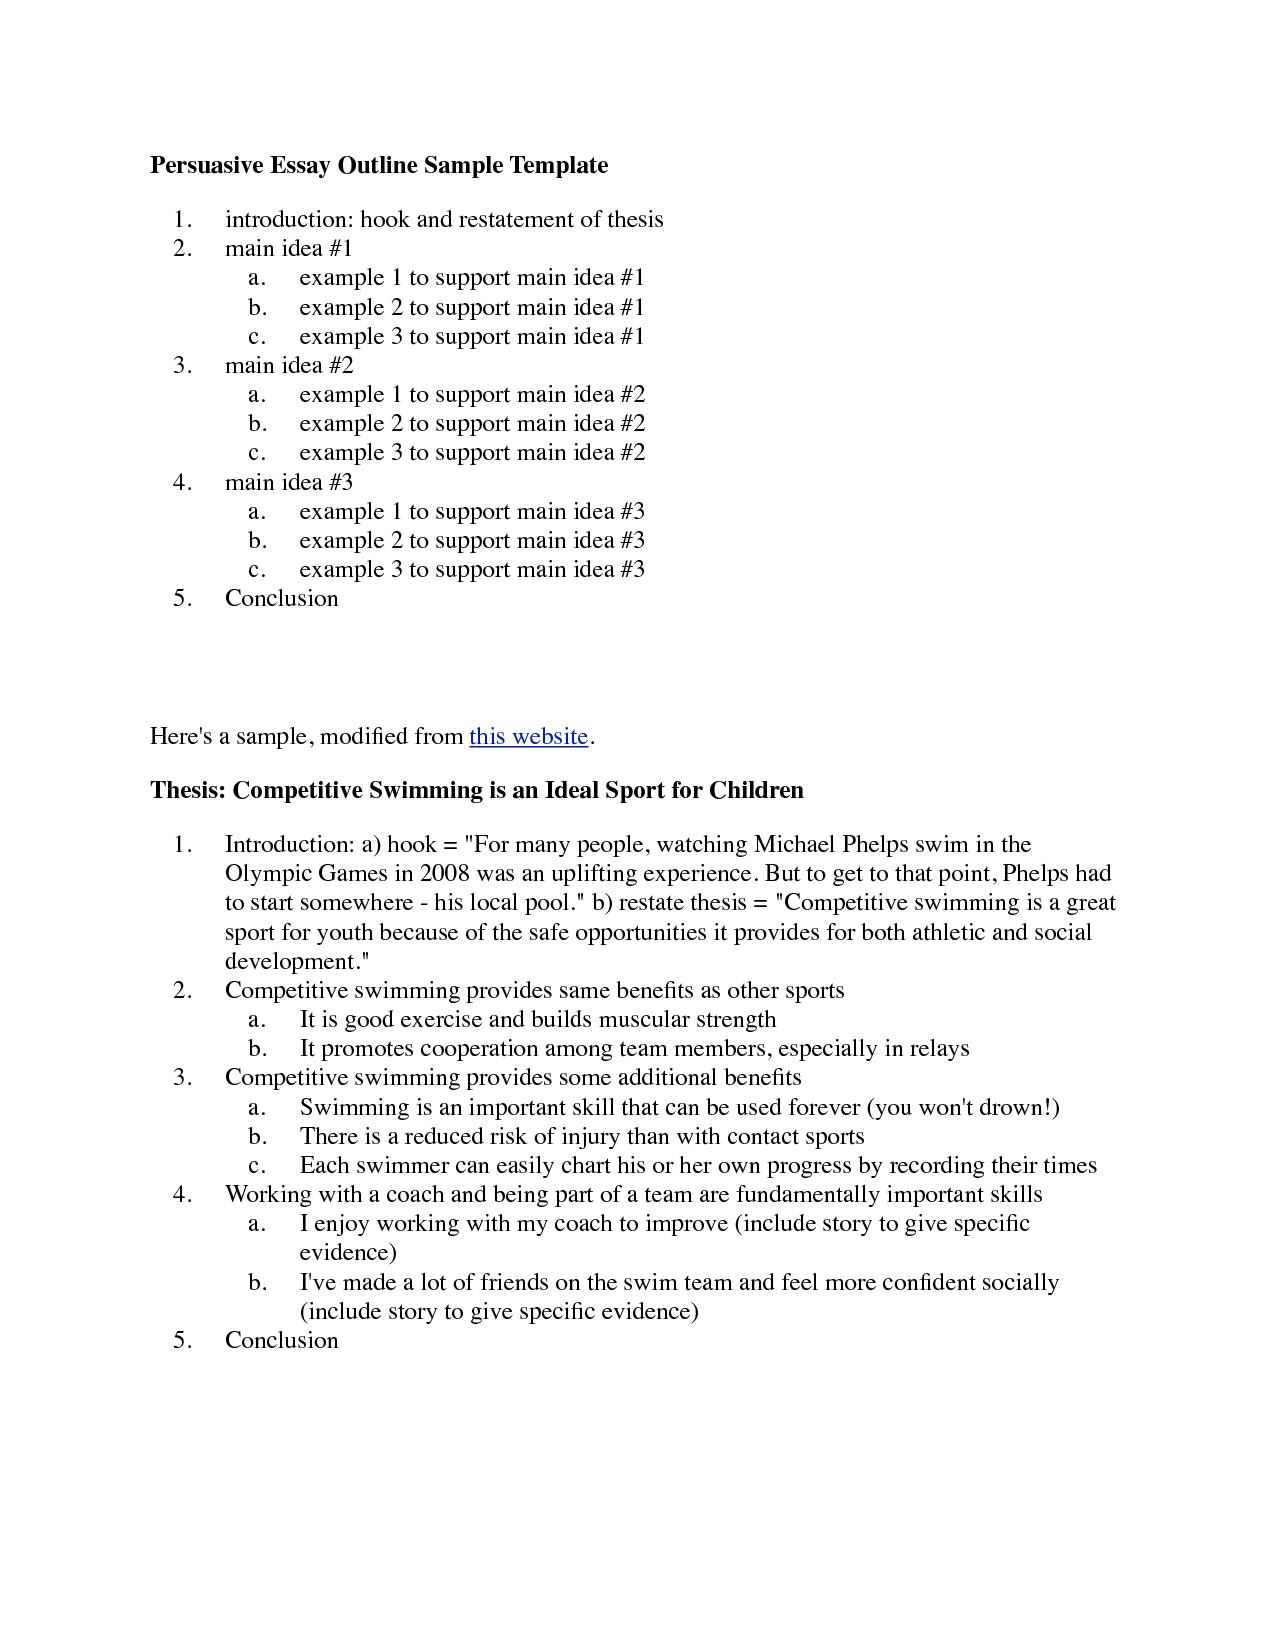 High School Persuasive Essay Hammurabi Essay Example Thesis Essay Topics also Proposal Essay Topics Ideas Hammurabi Essay Example  Httpessaysuscomessaycapital Essay On Terrorism In English